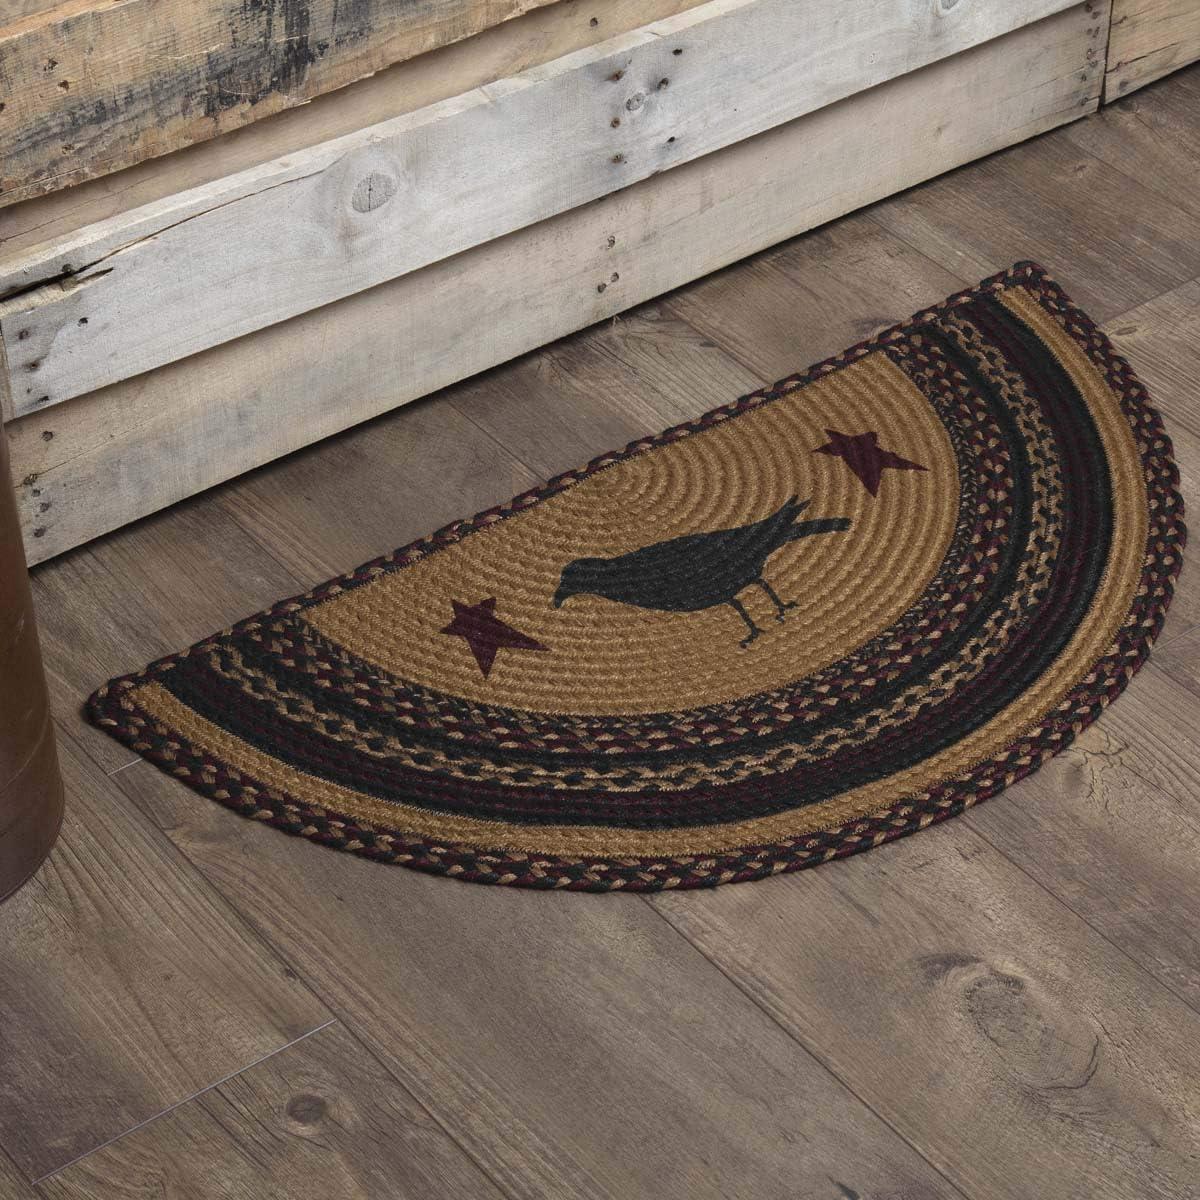 VHC Brands 37900 Primitive Flooring-Heritage Farms Tan Crow Half Circle Jute Rug, 1 4.5 x 2 9 , Mustard Yellow